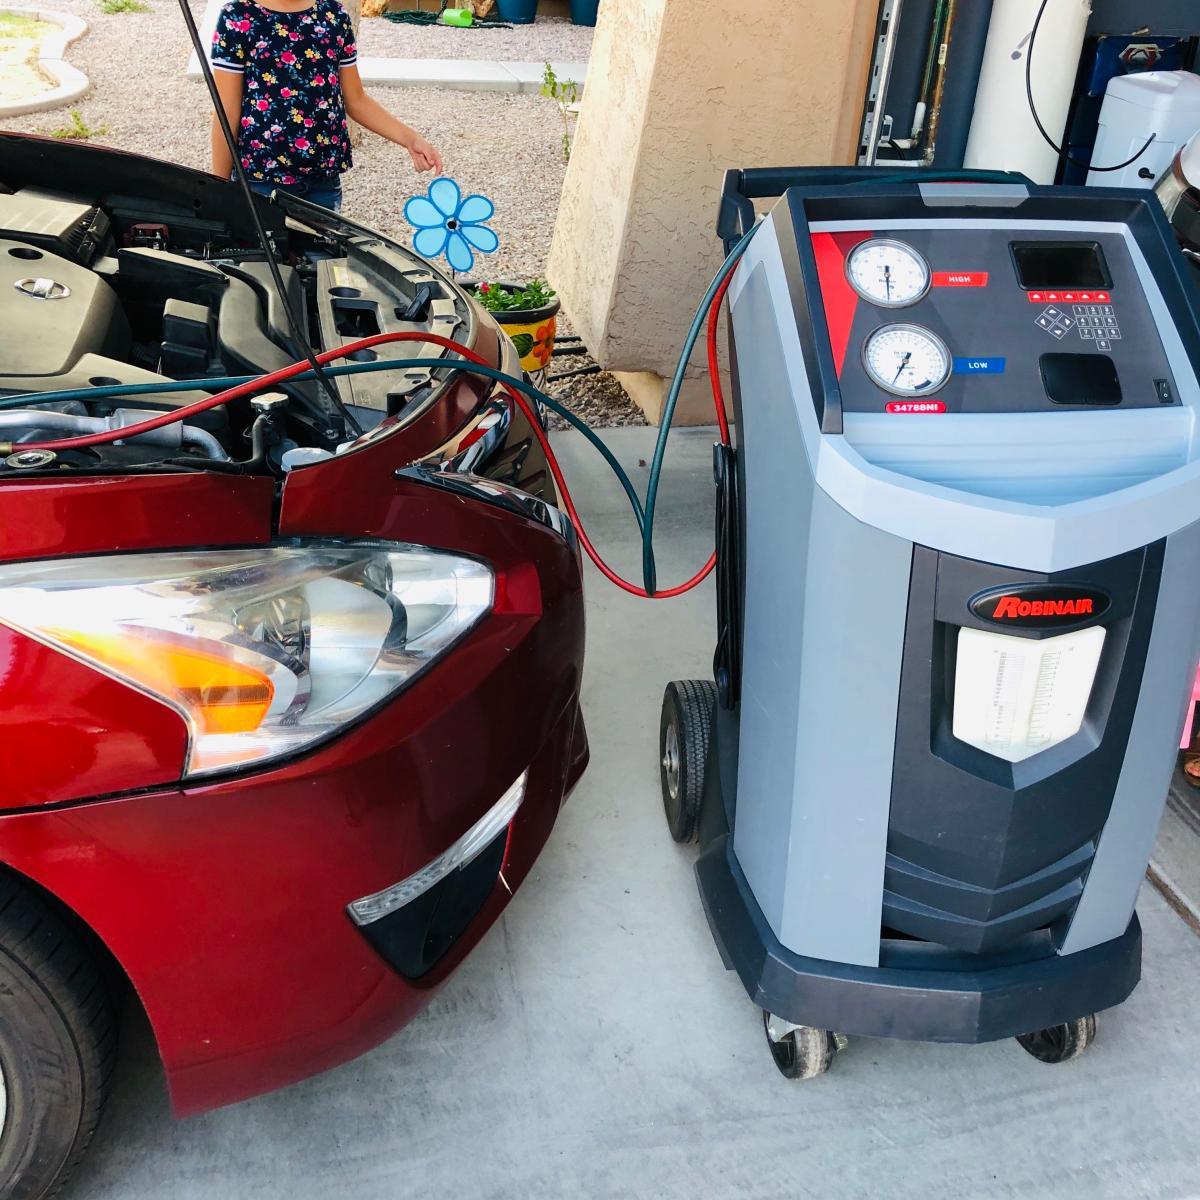 Photo 1 of Car HVAC service